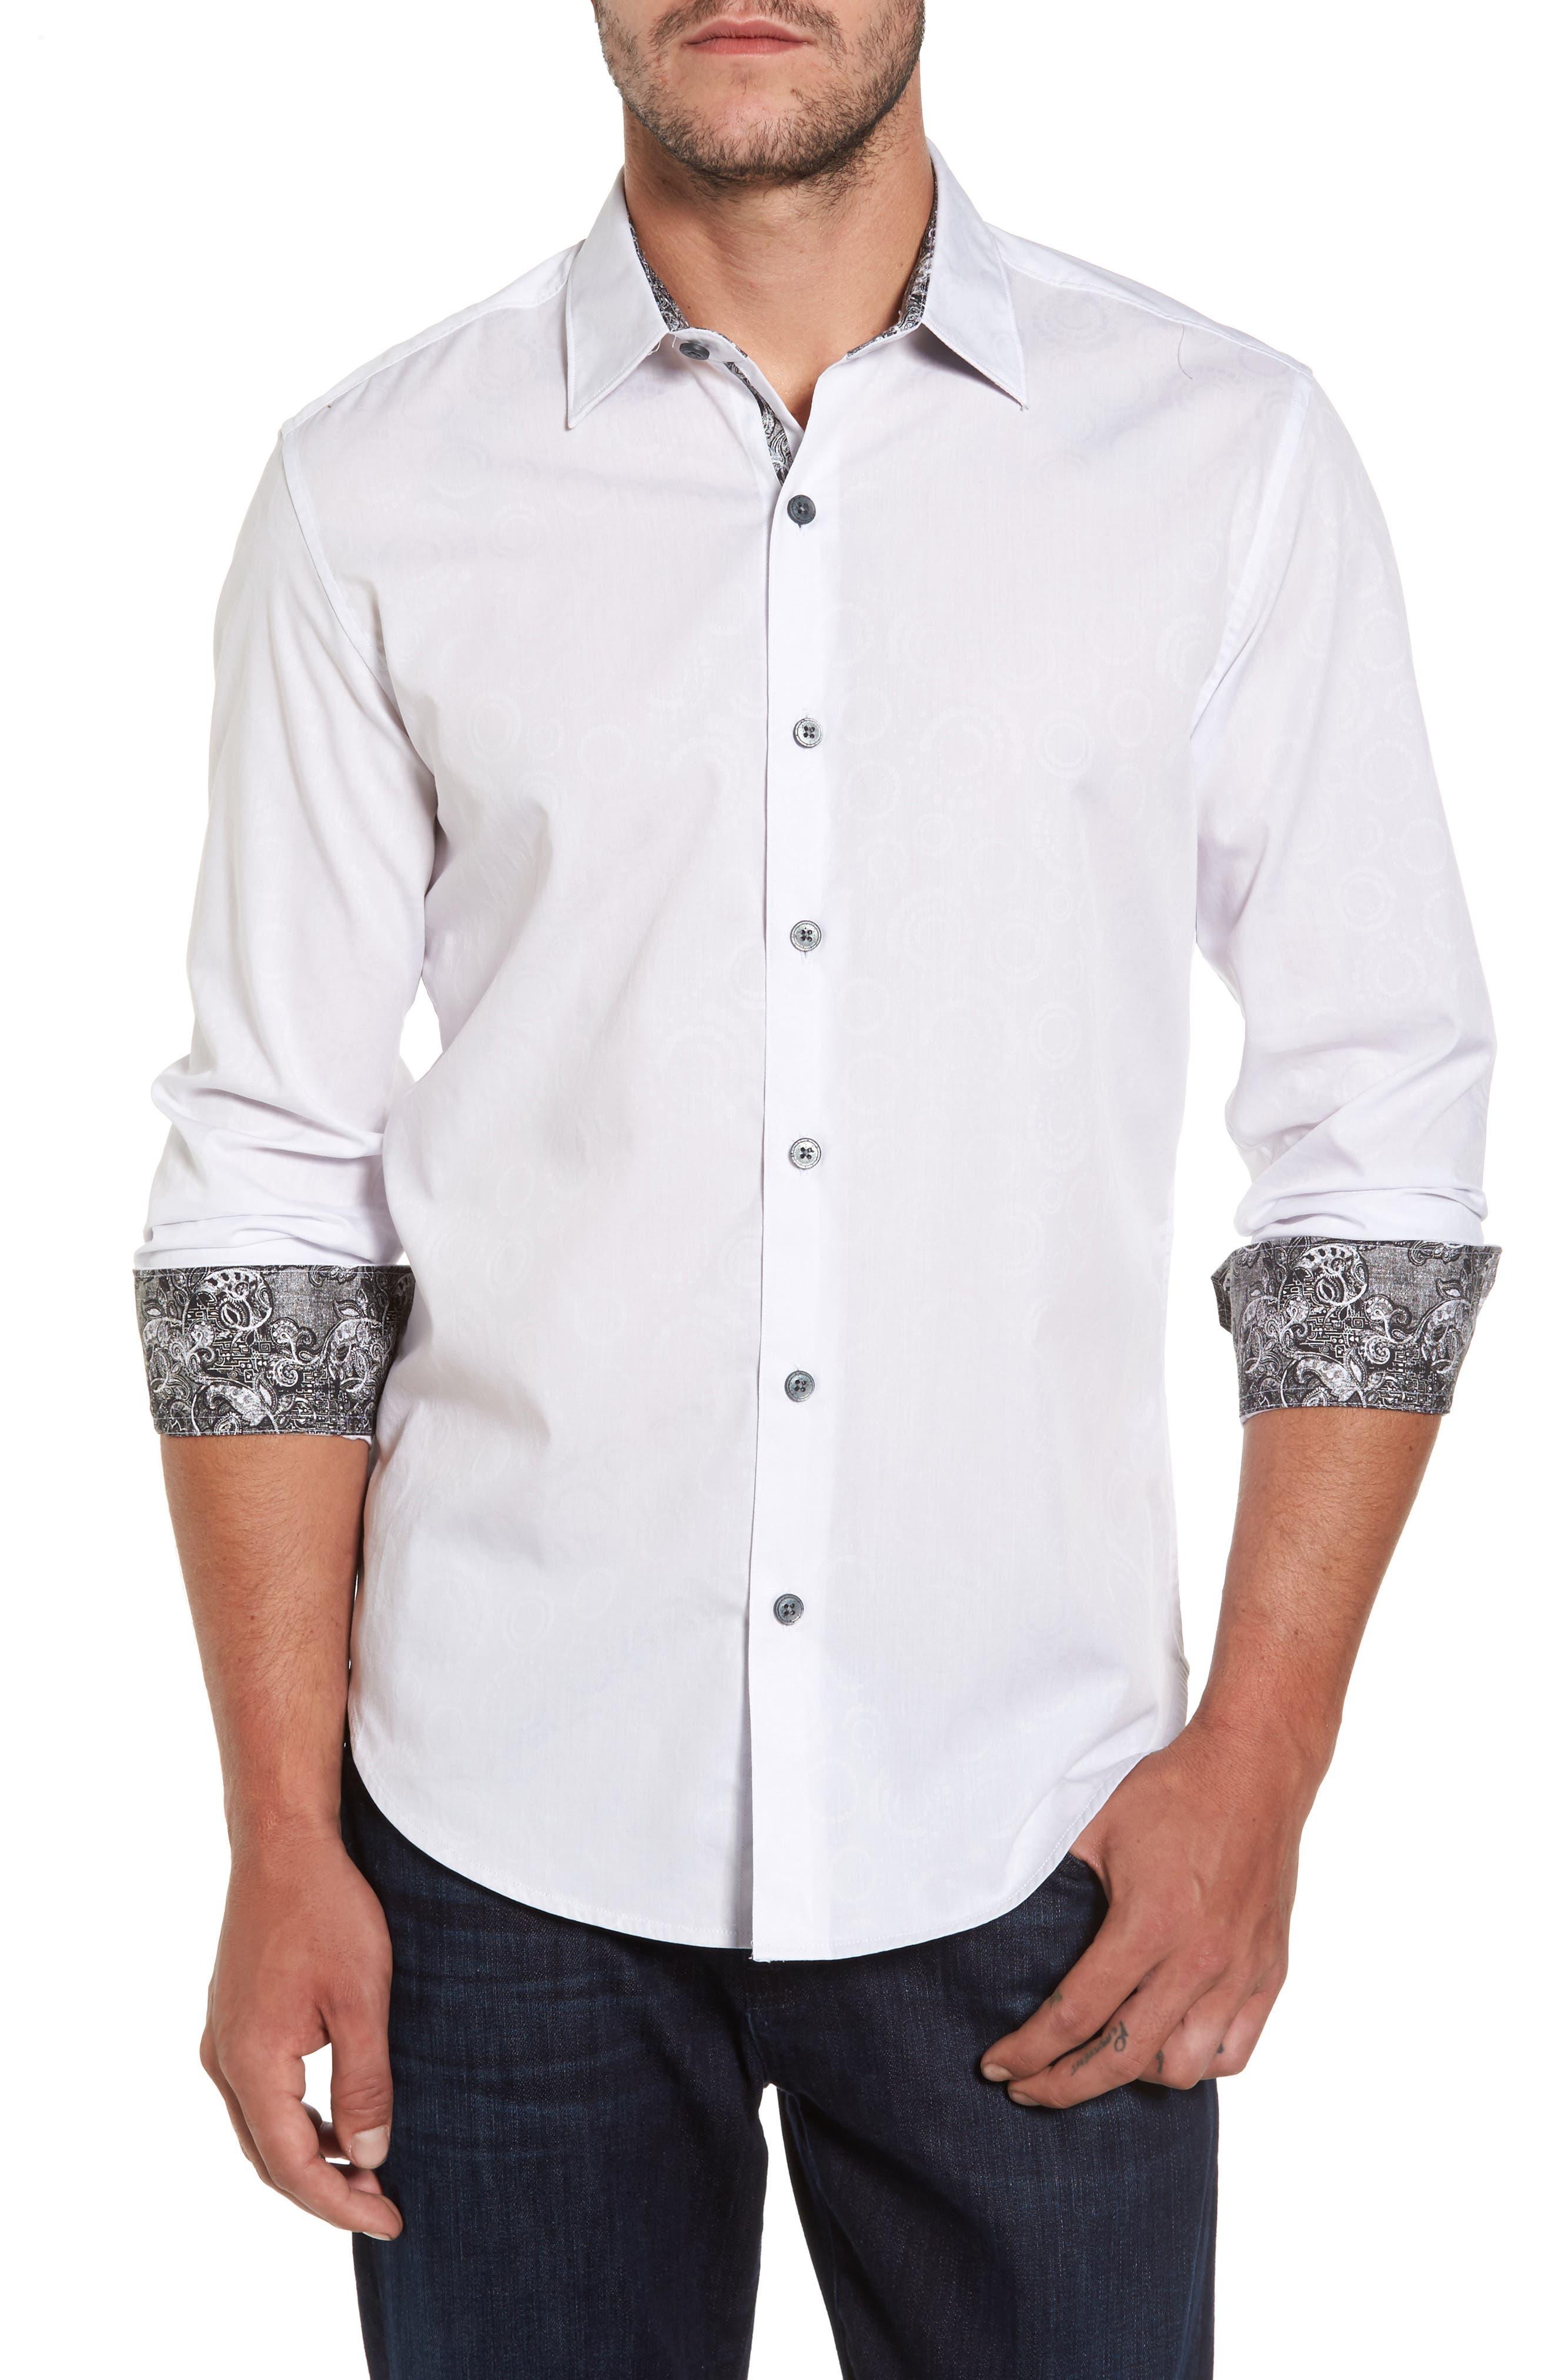 Binghampton Regular Fit Sport Shirt,                             Main thumbnail 1, color,                             White